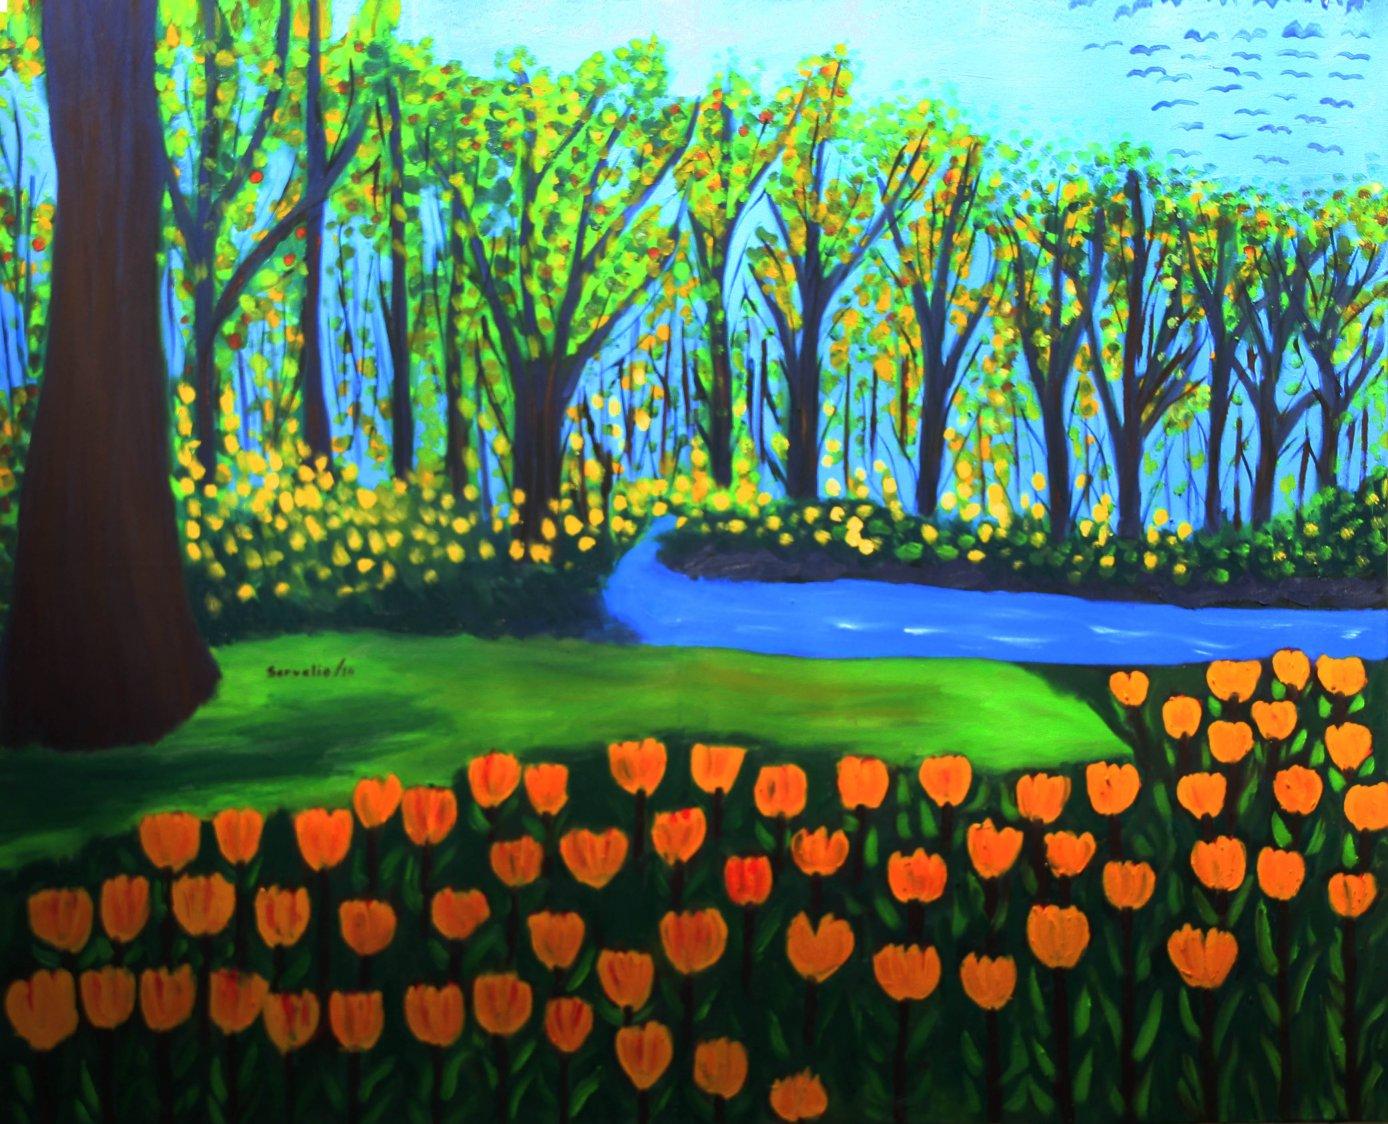 Bosque con flores (2016) - Servelio Hernández Sierra